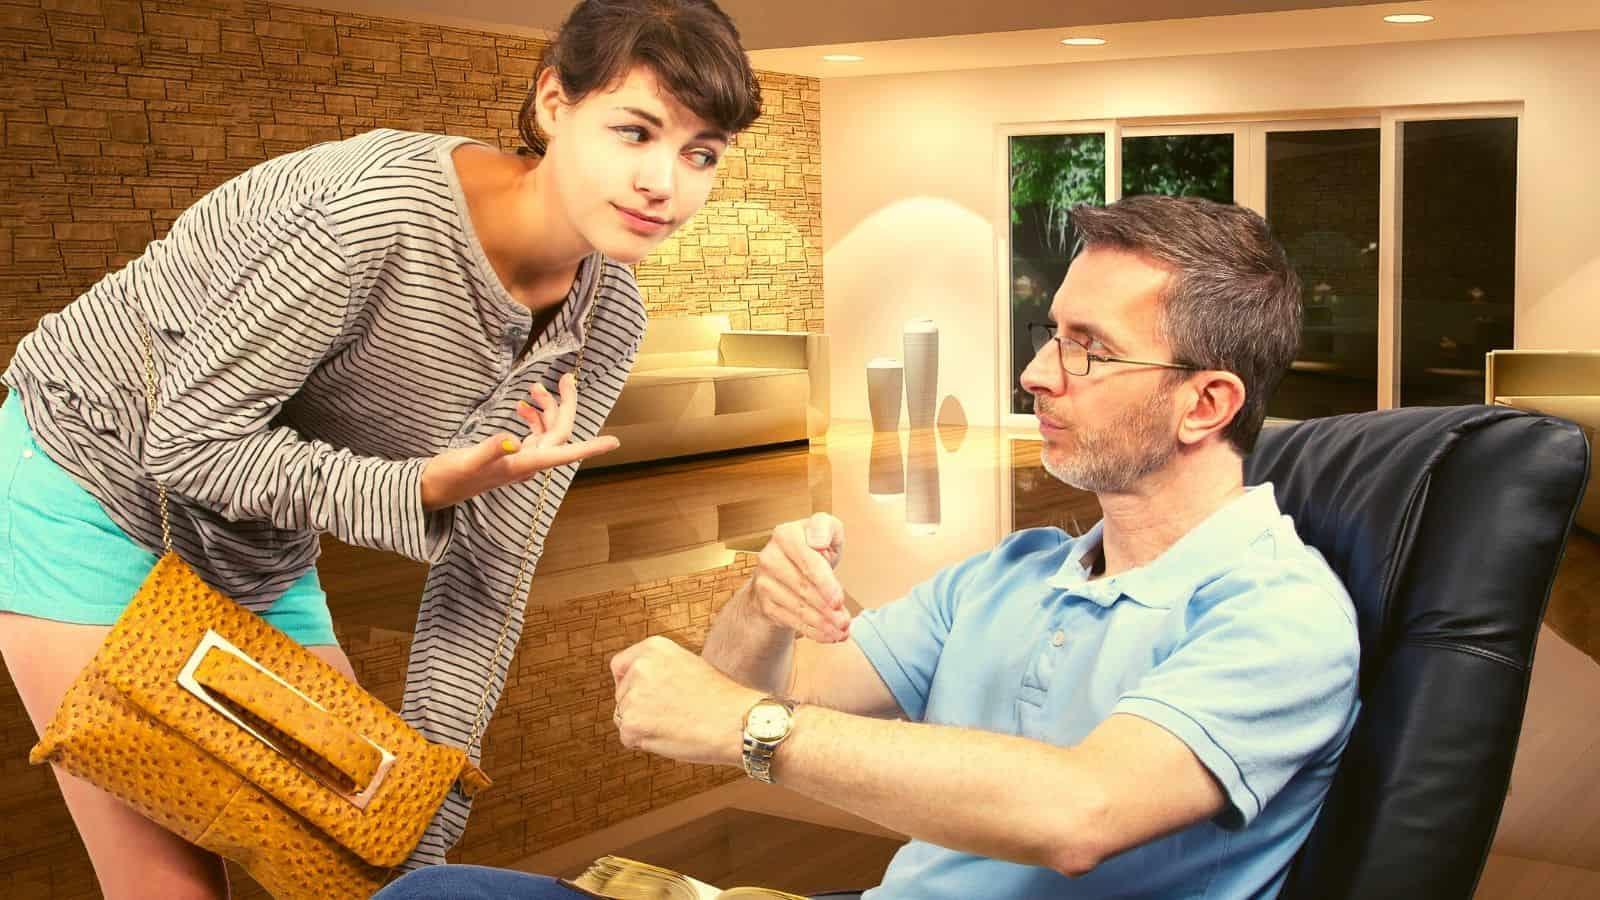 curfews for teenagers